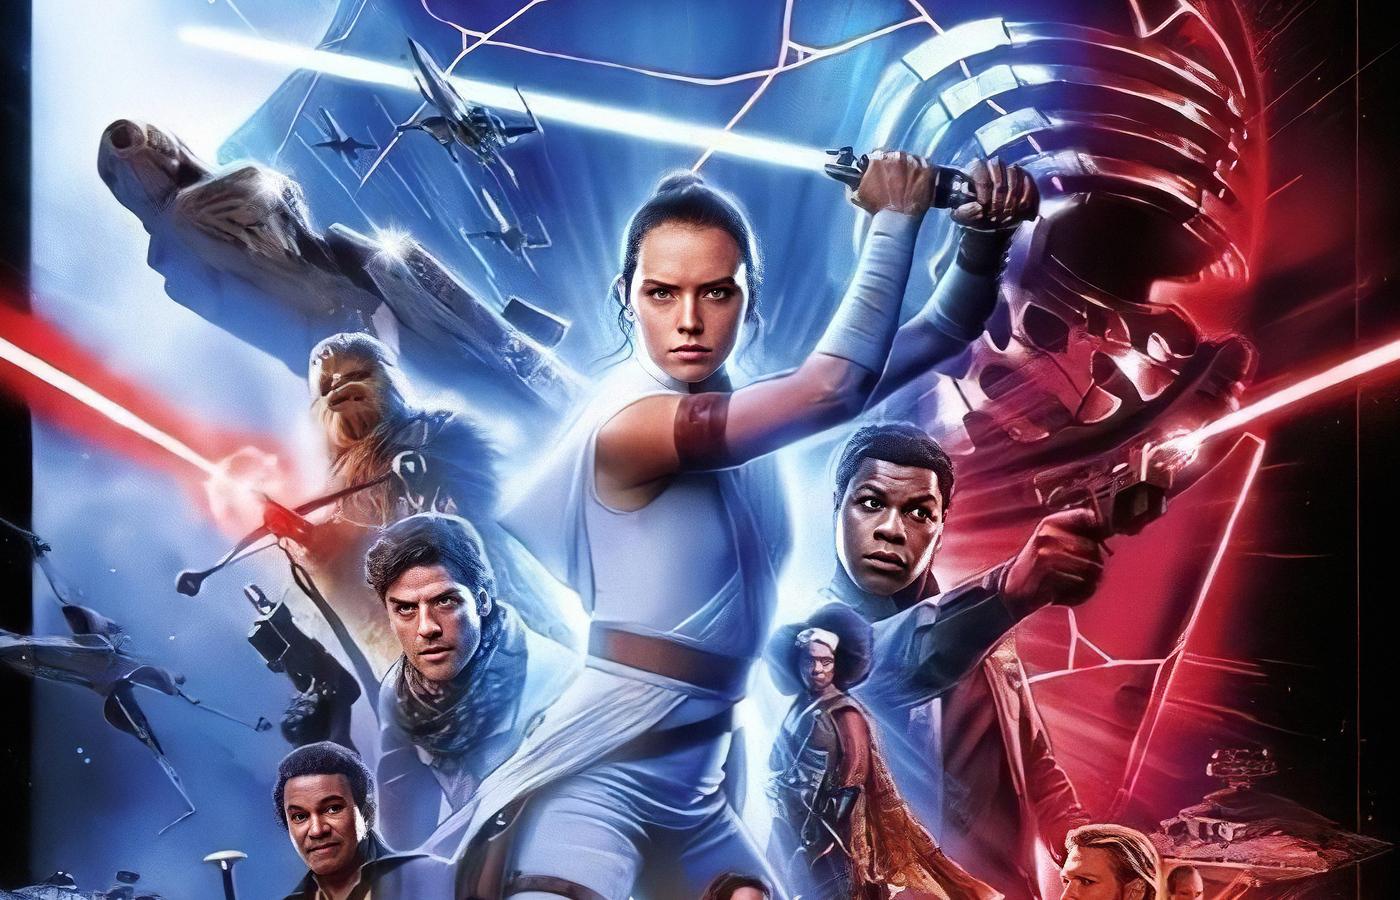 star-wars-the-rise-of-skywalker-new-imax-poster-b1.jpg